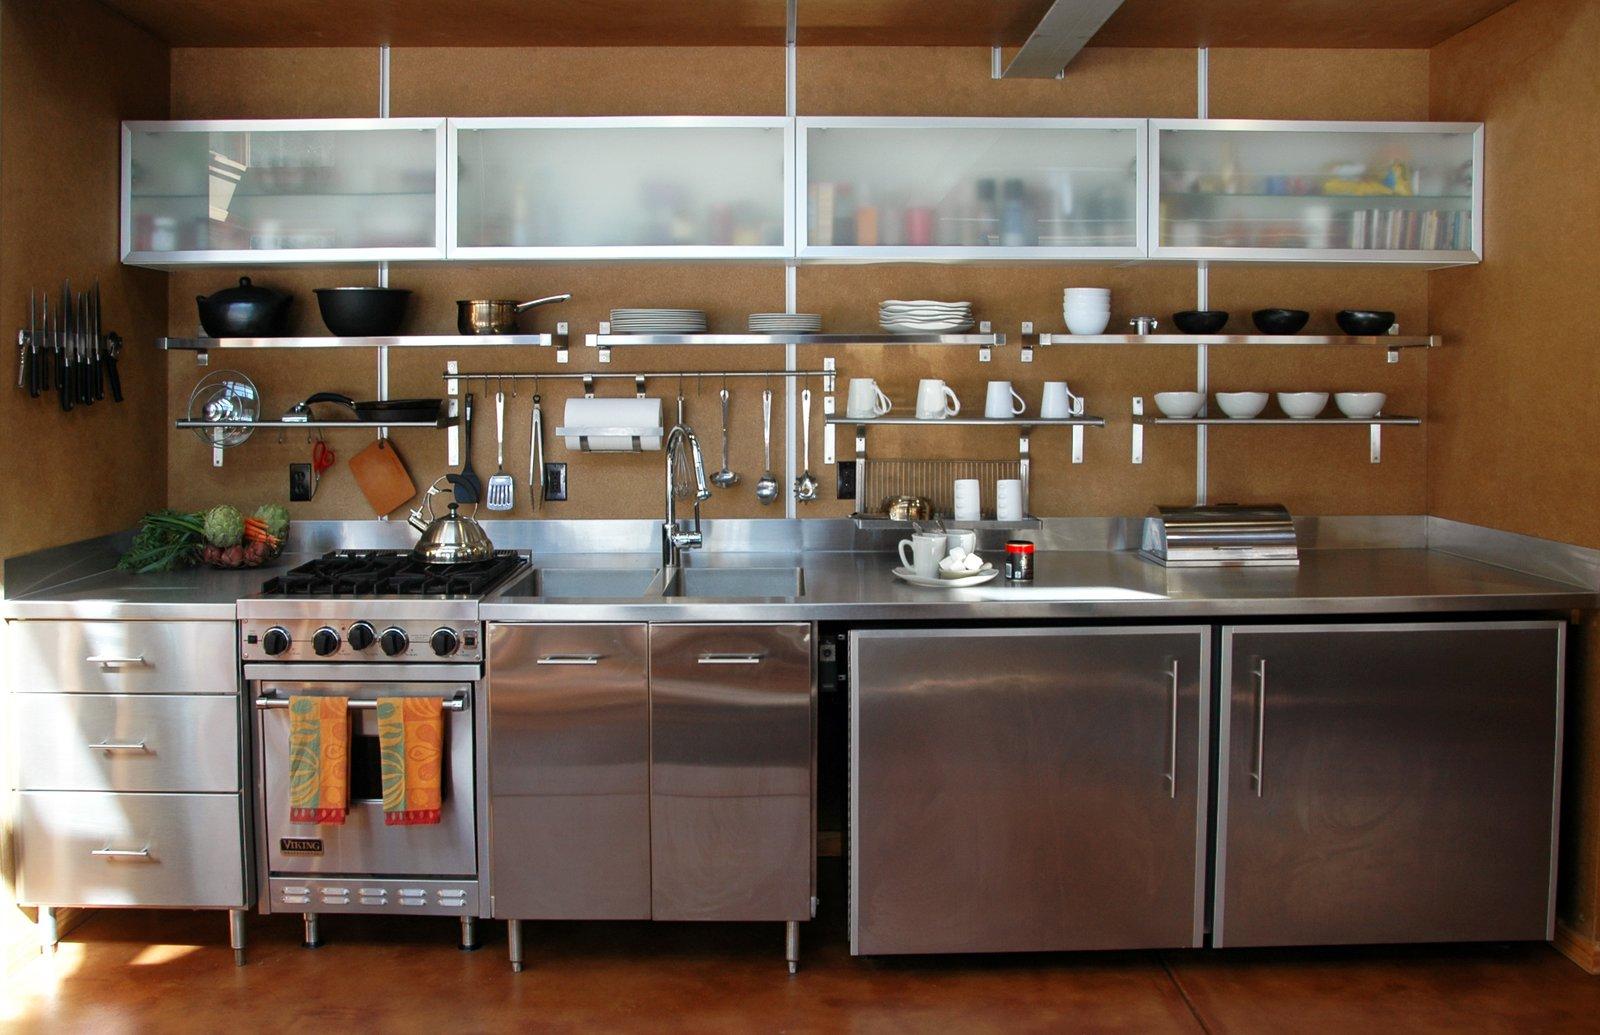 Kitchen, Refrigerator, Range, Metal, Metal, and Concrete  Best Kitchen Refrigerator Metal Photos from Wee Ski Chalet